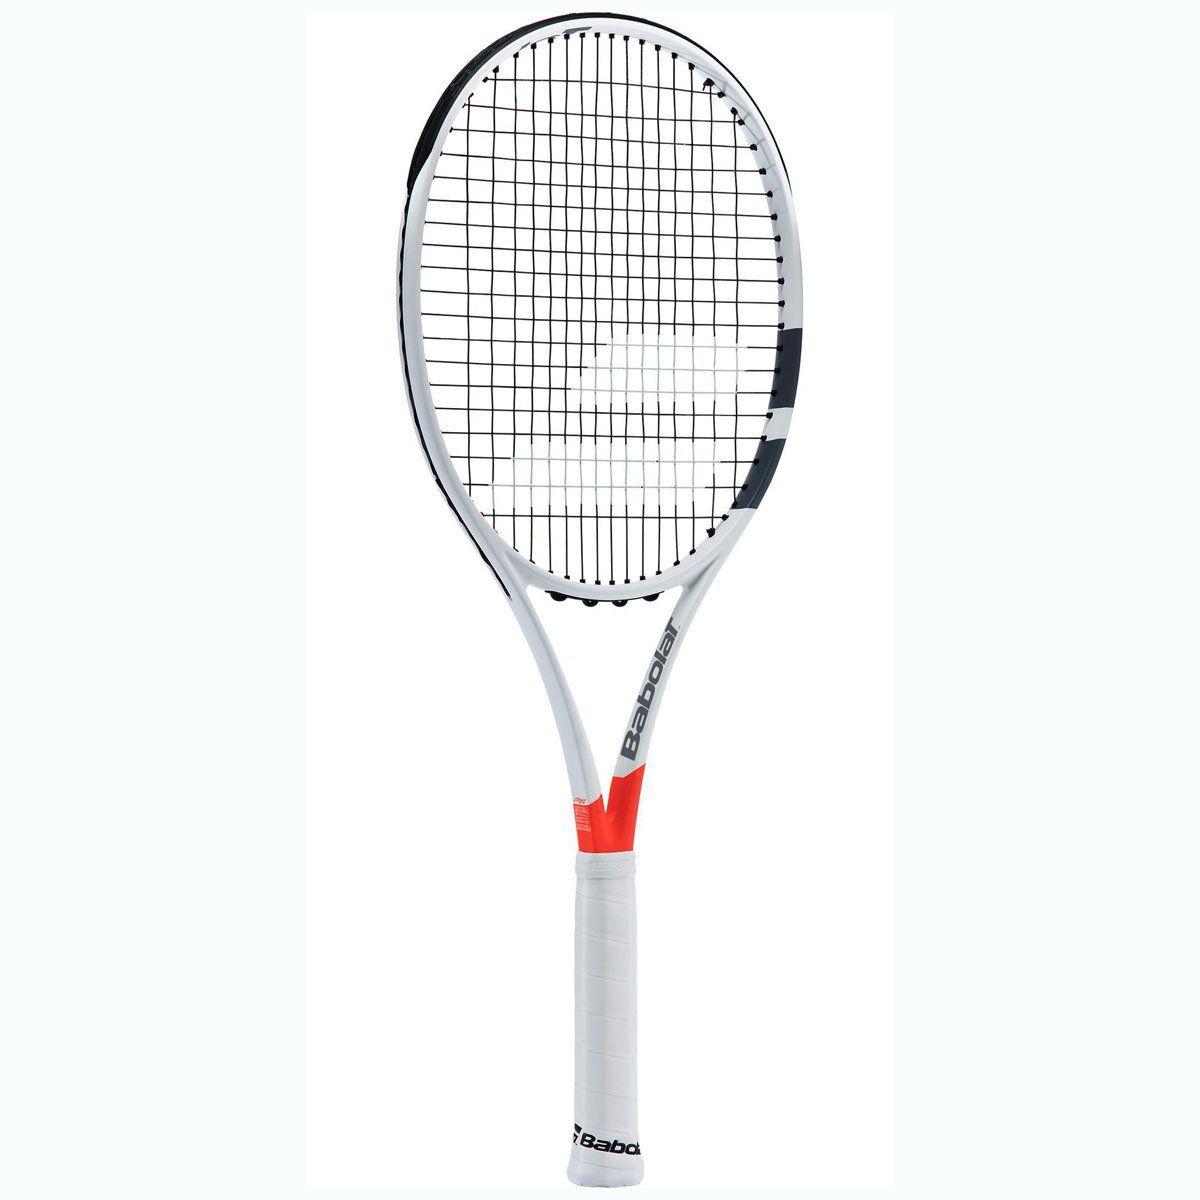 Buy Babolat Pure Strike Super Lite Tennis Racquet Unstrung Online Order Babolat Pure Strike Super Lite Tennis Racqu Tennis Racquet Racquets Tennis